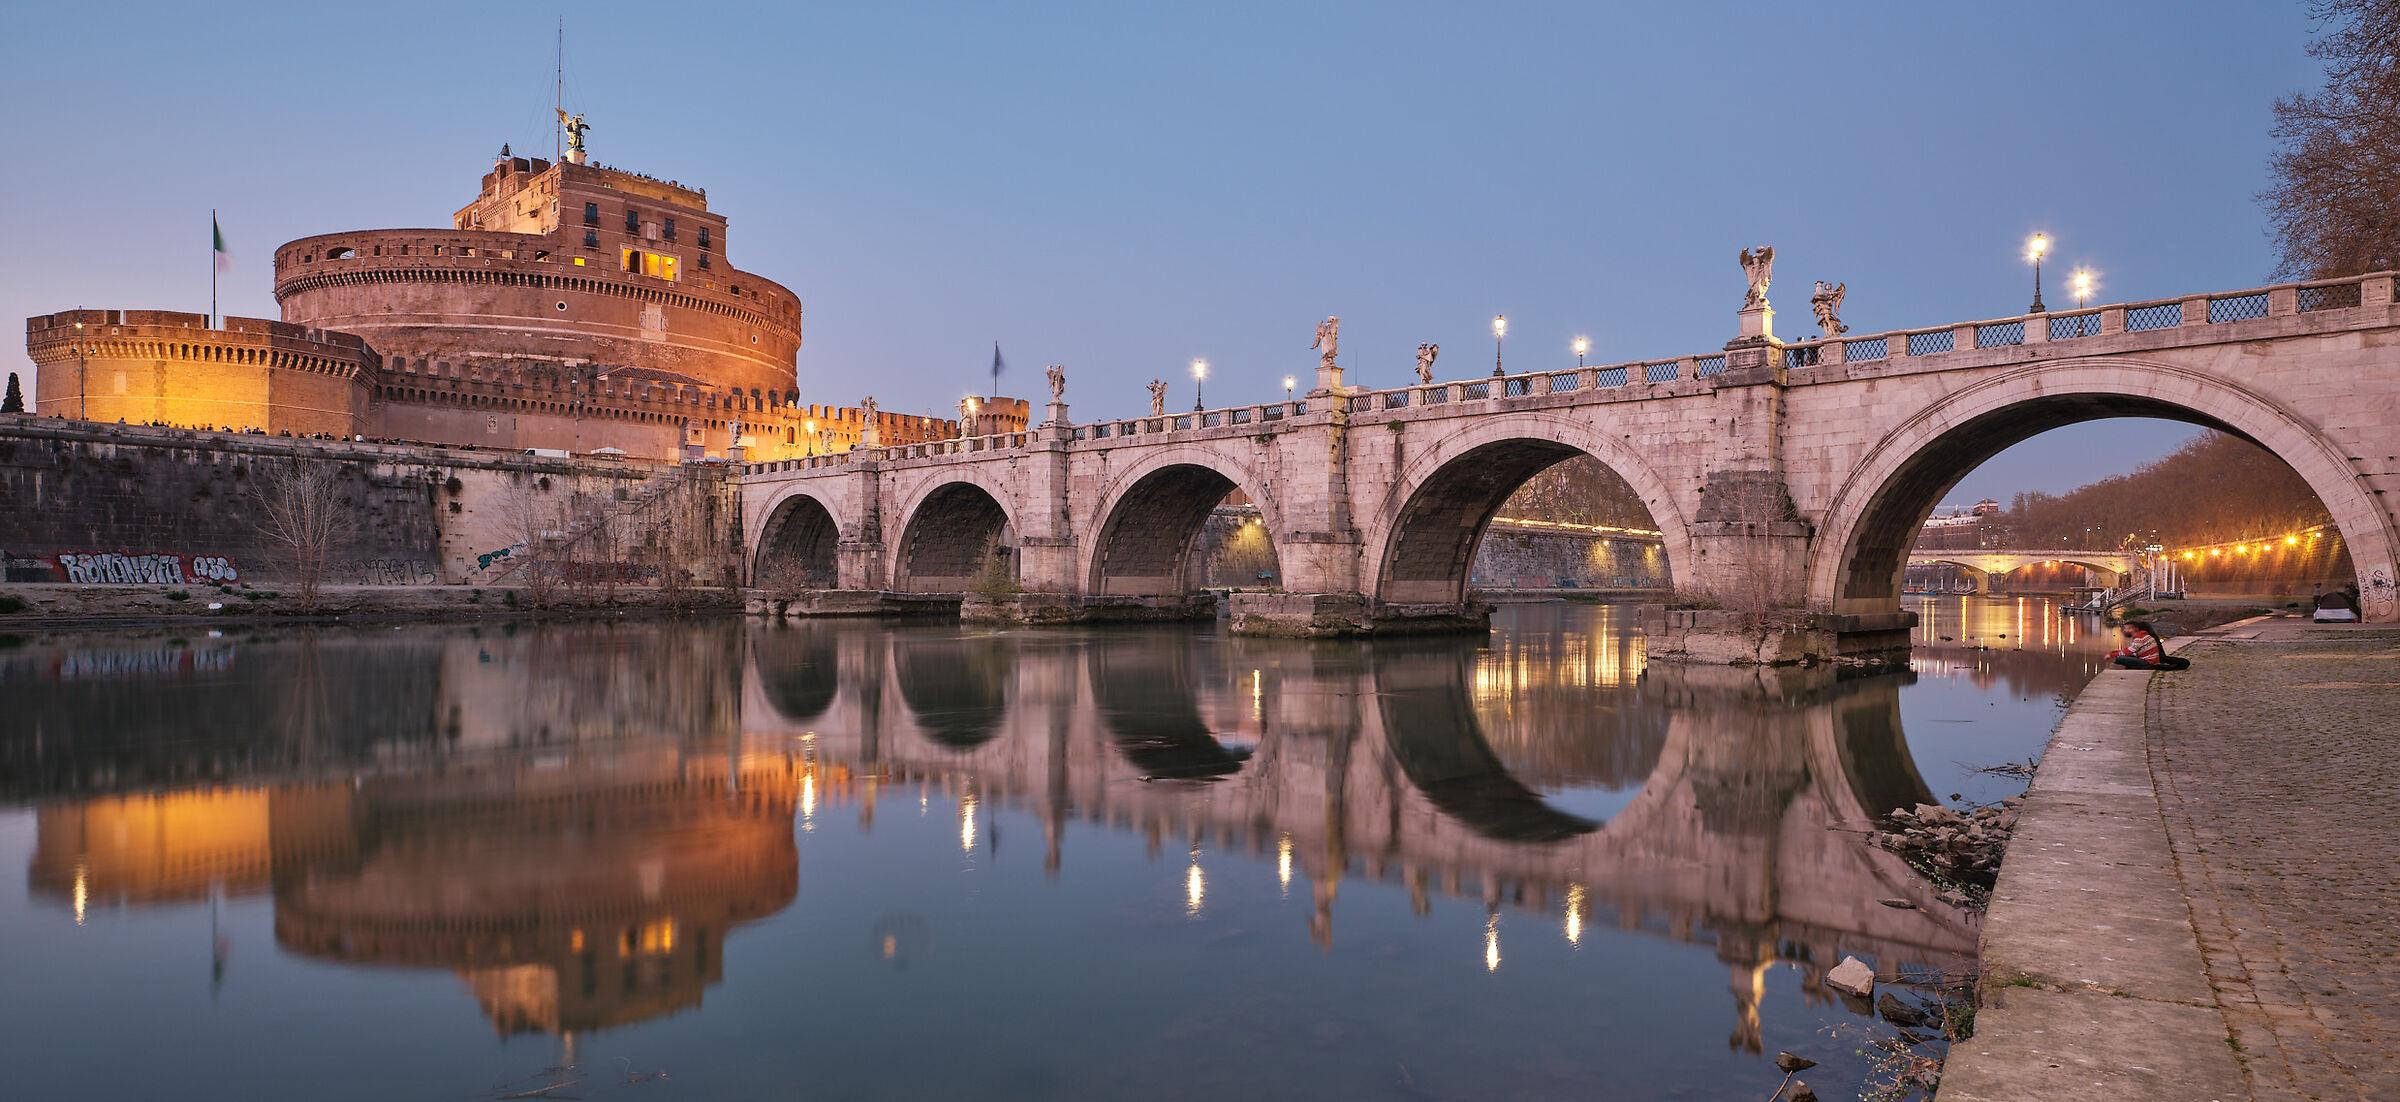 Castel Sant'Angelo...